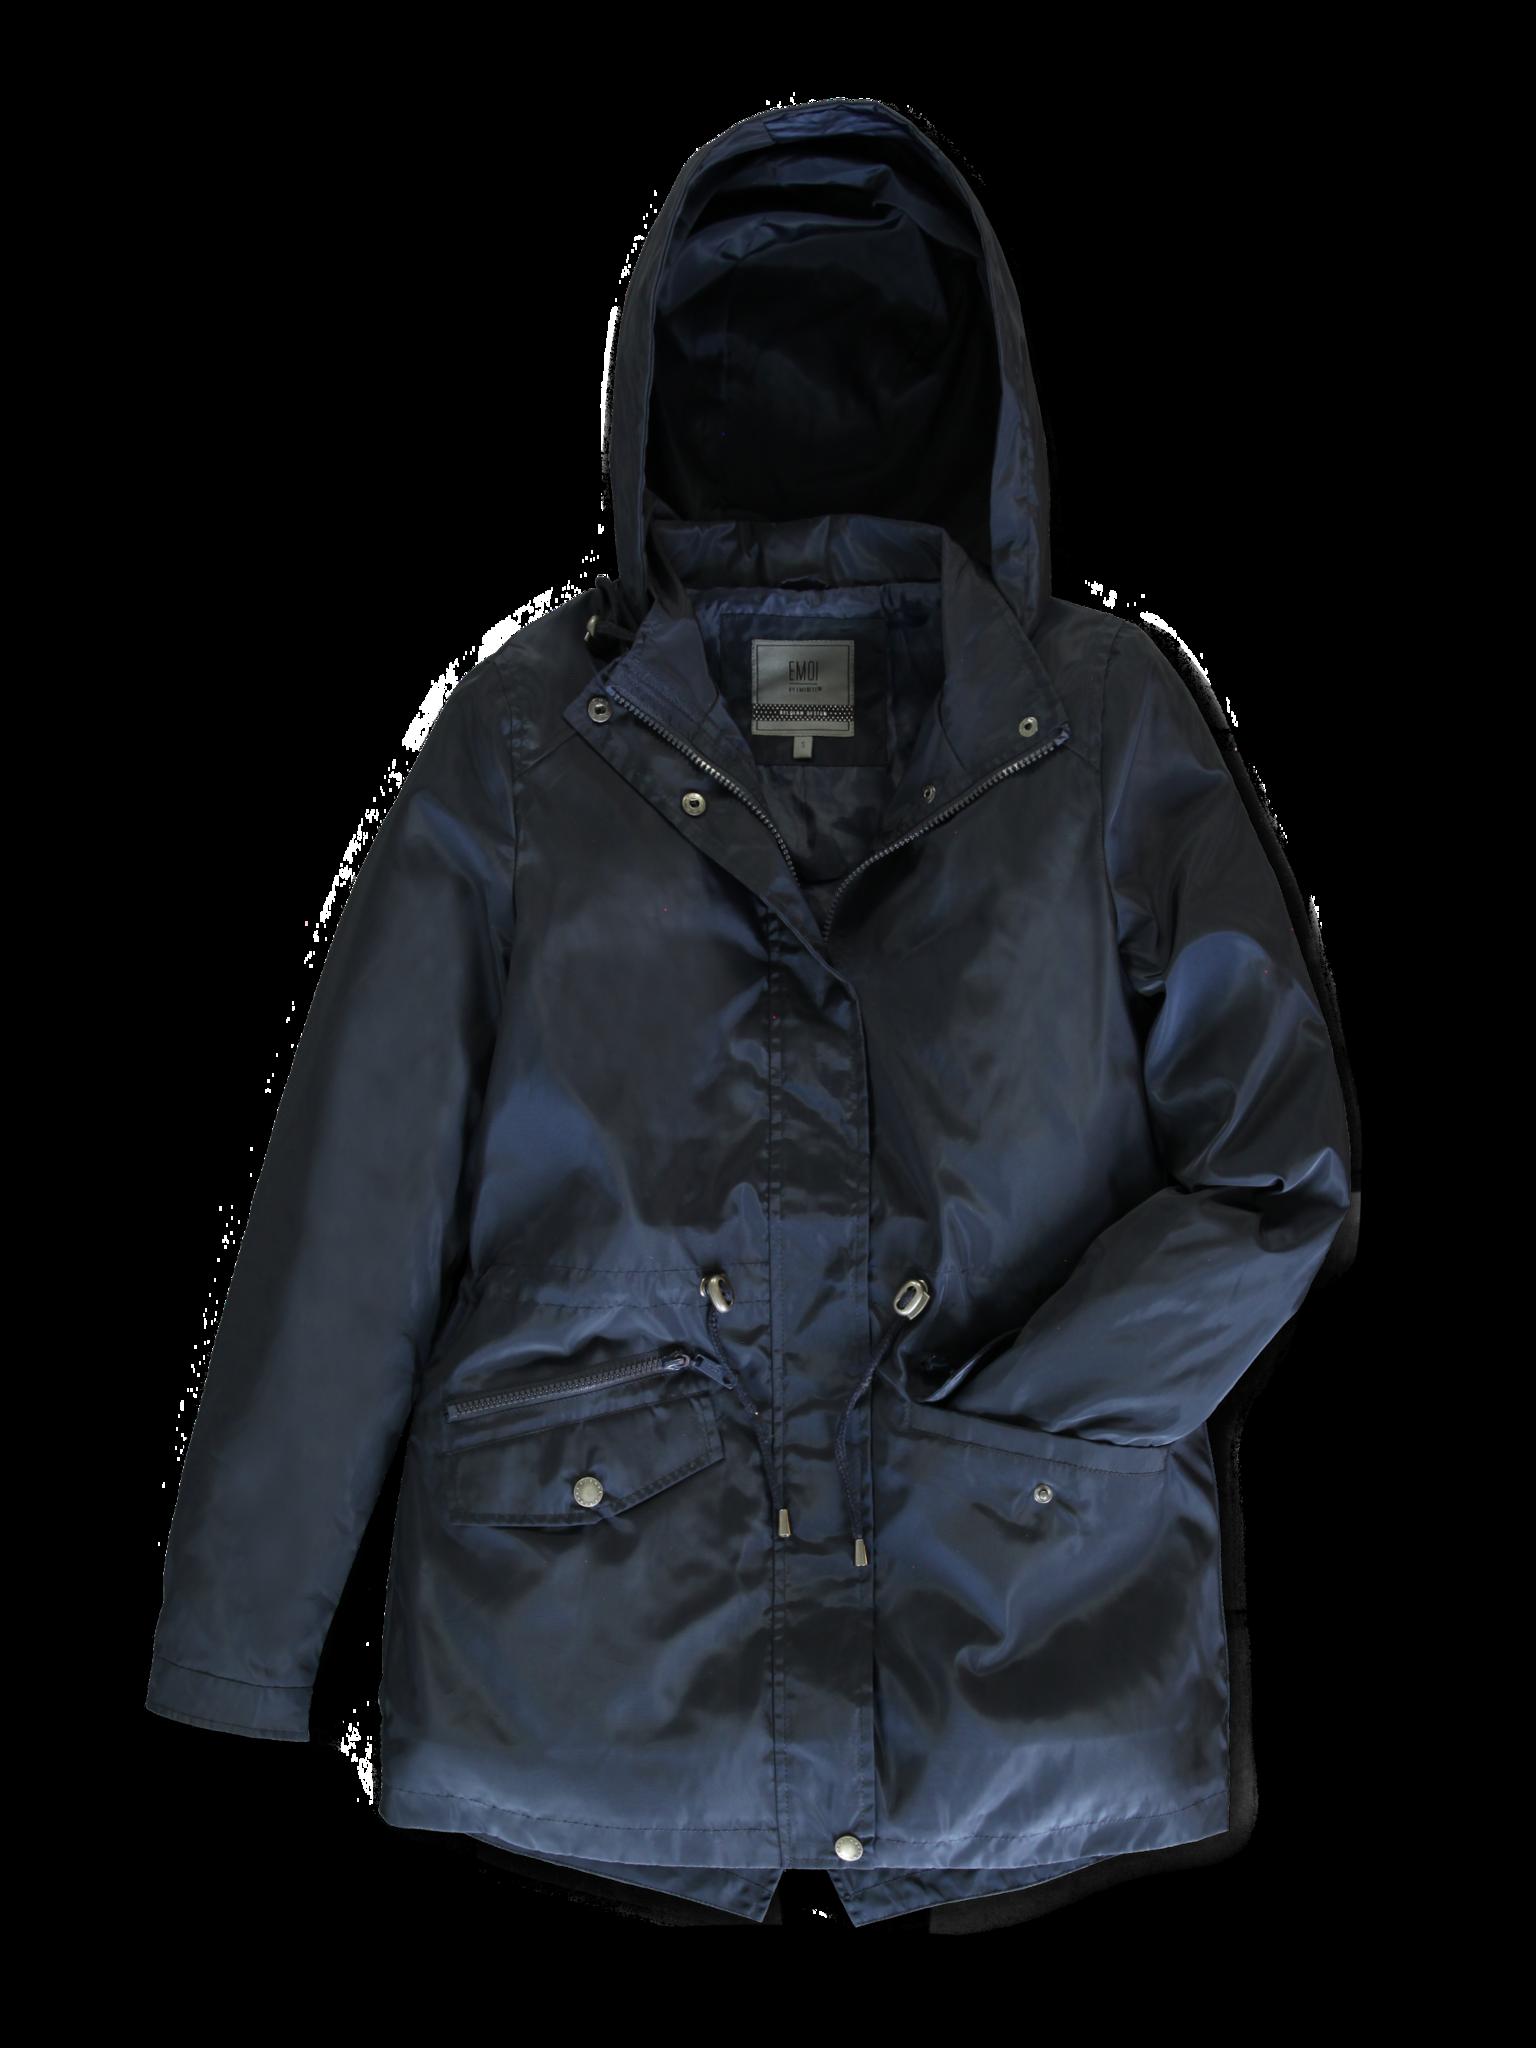 All Brands | Summerproducts Ladies | Jacket | 12 pcs/box